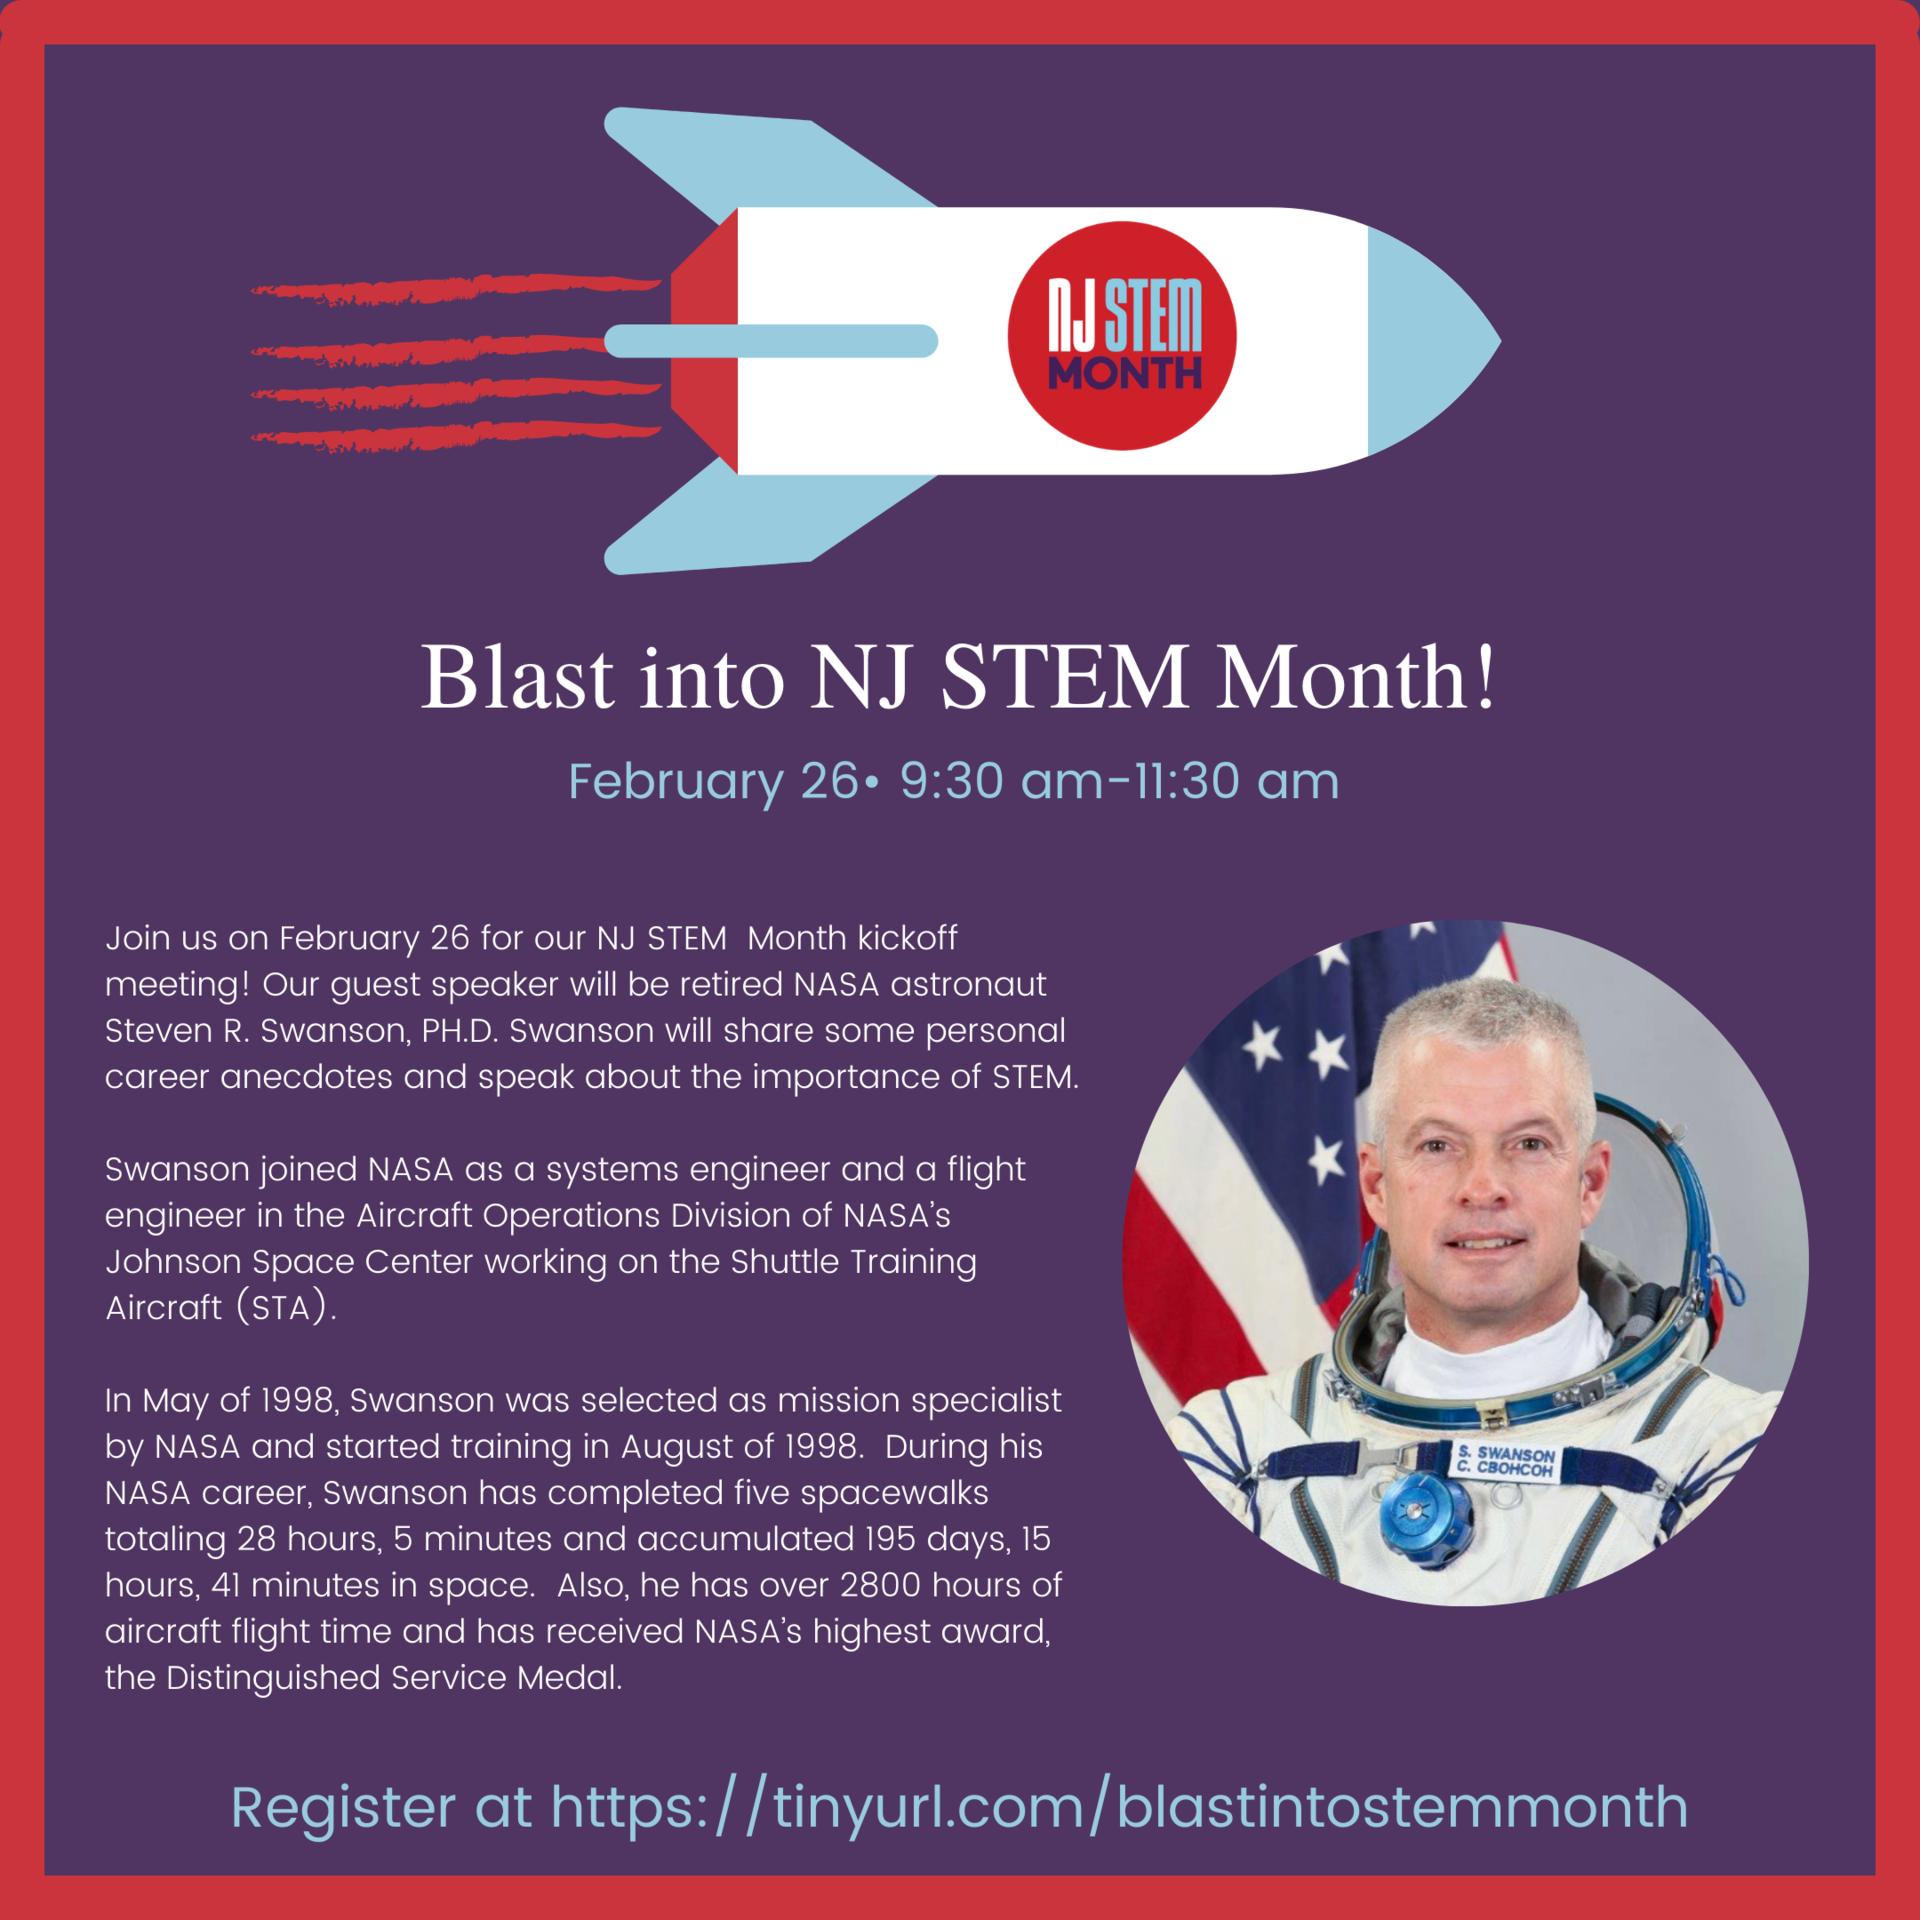 Blast into NJ STEM Month!